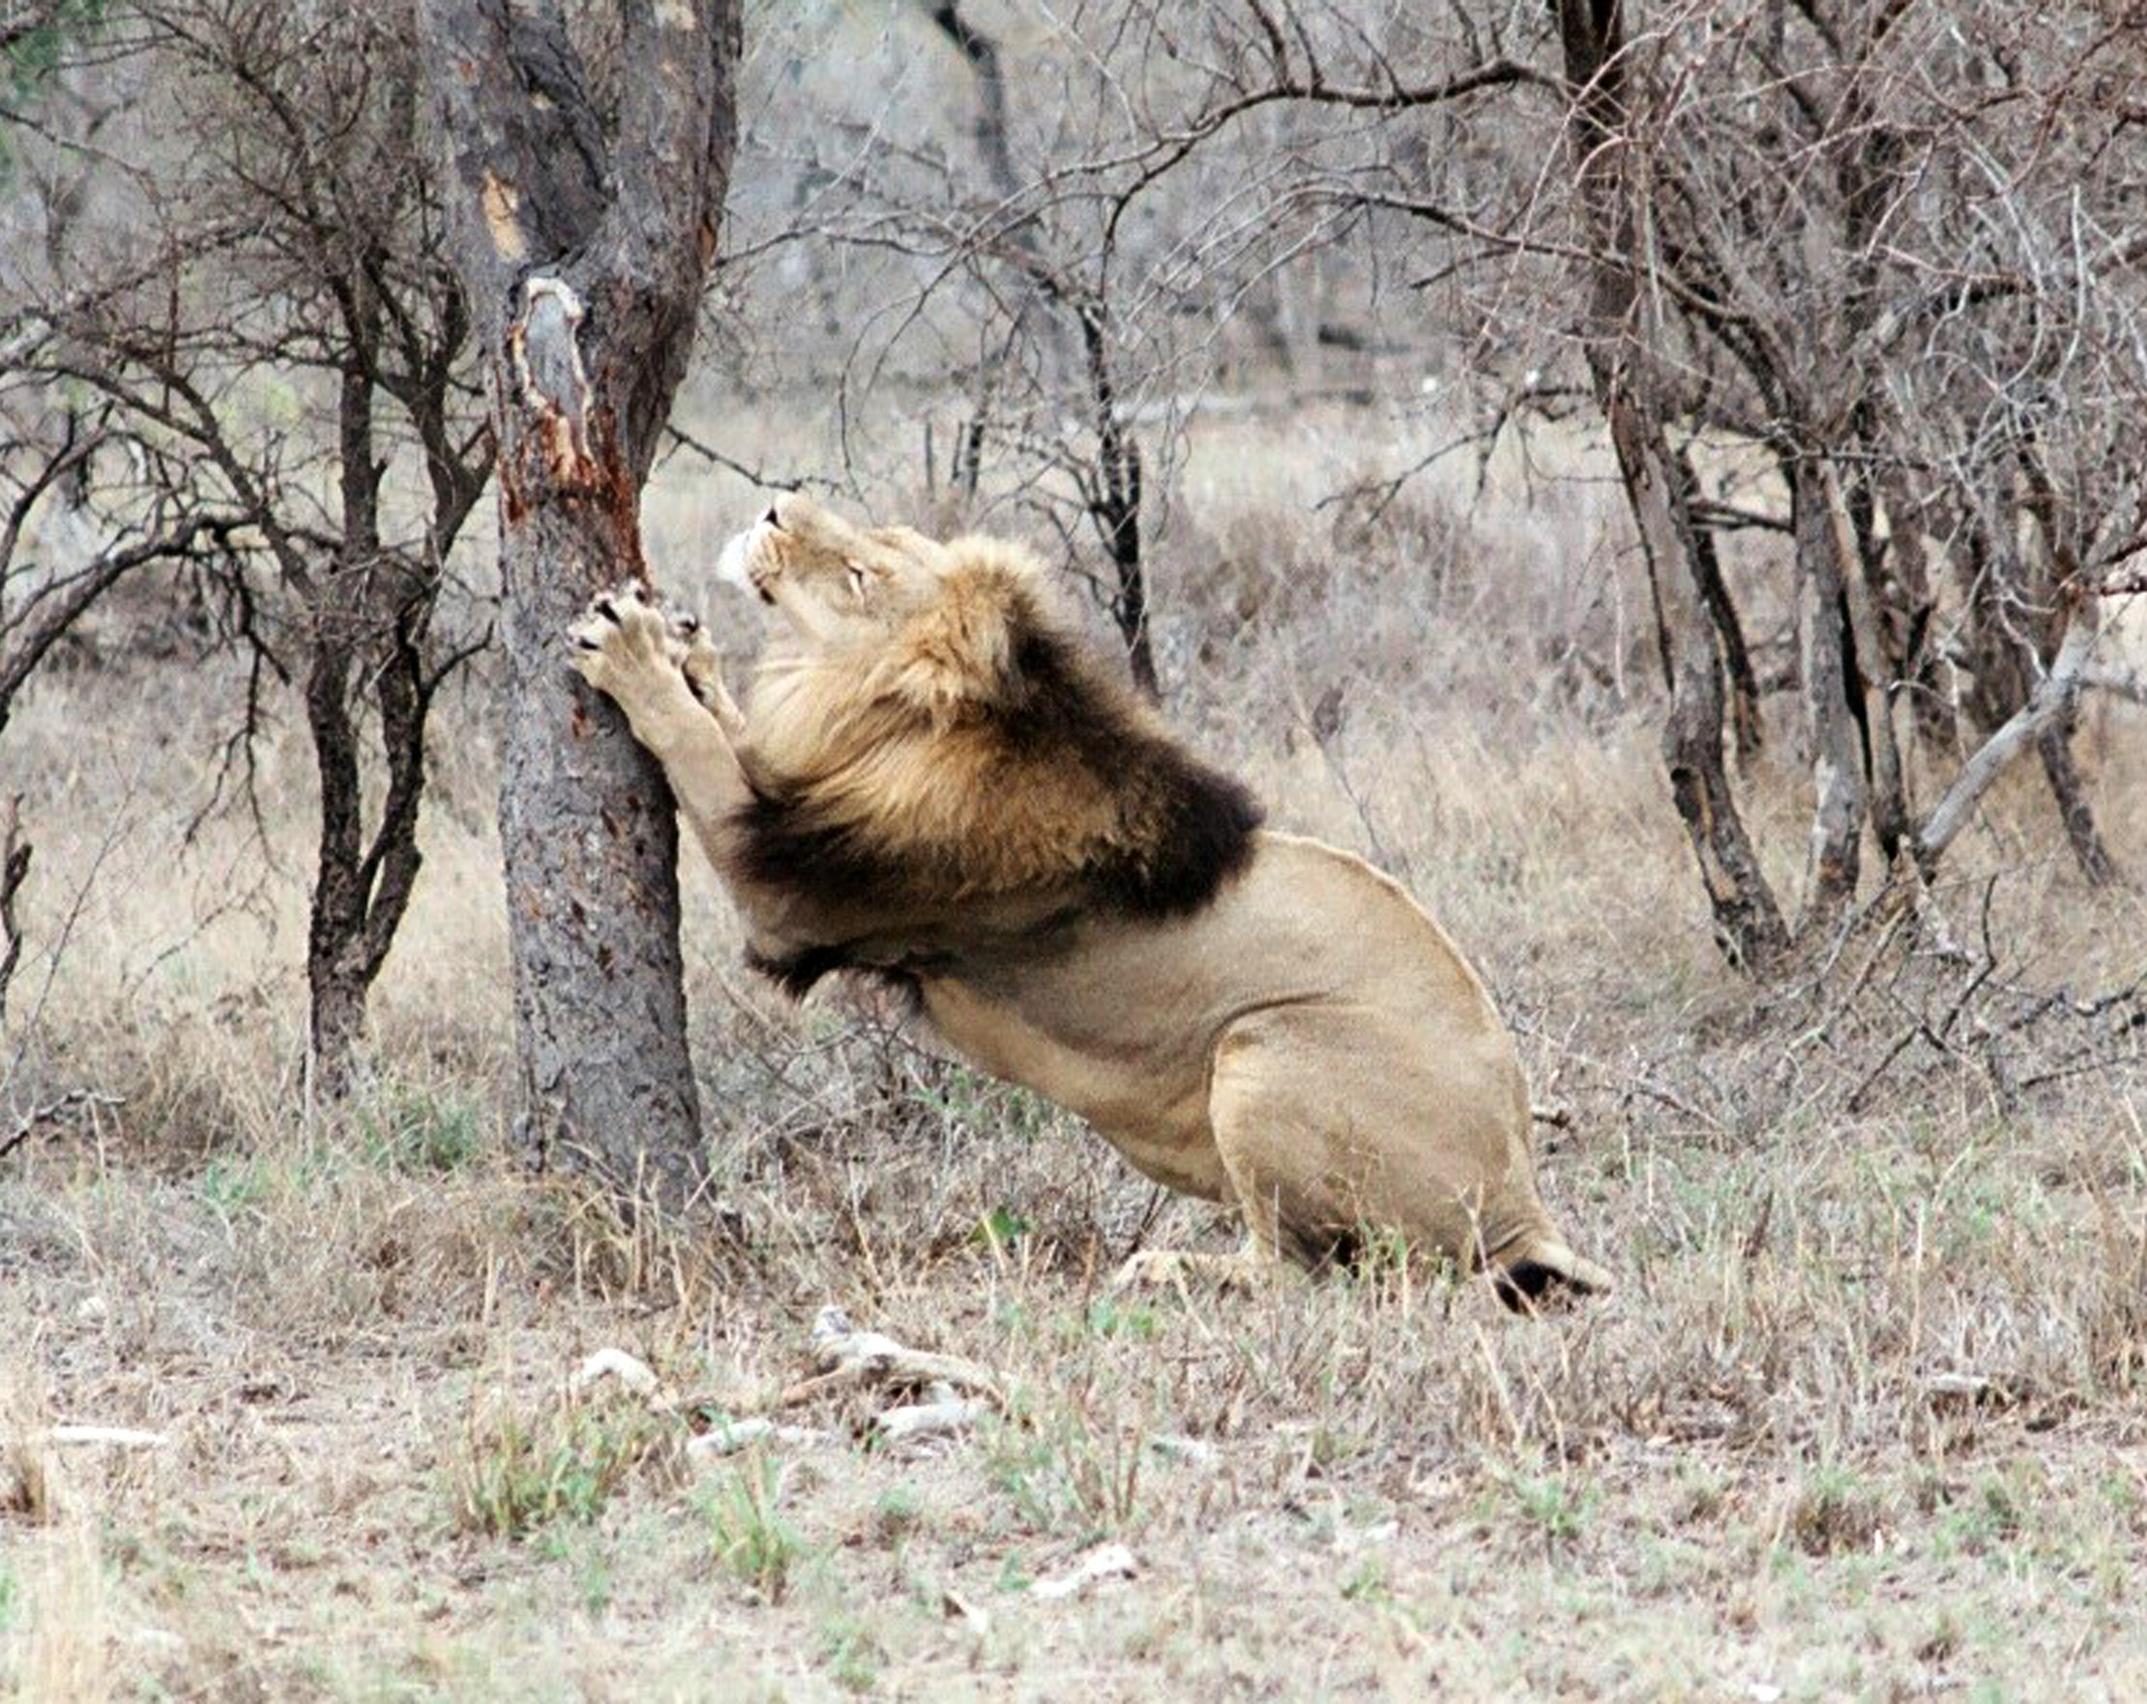 Lion Marking territorycrop.jpg